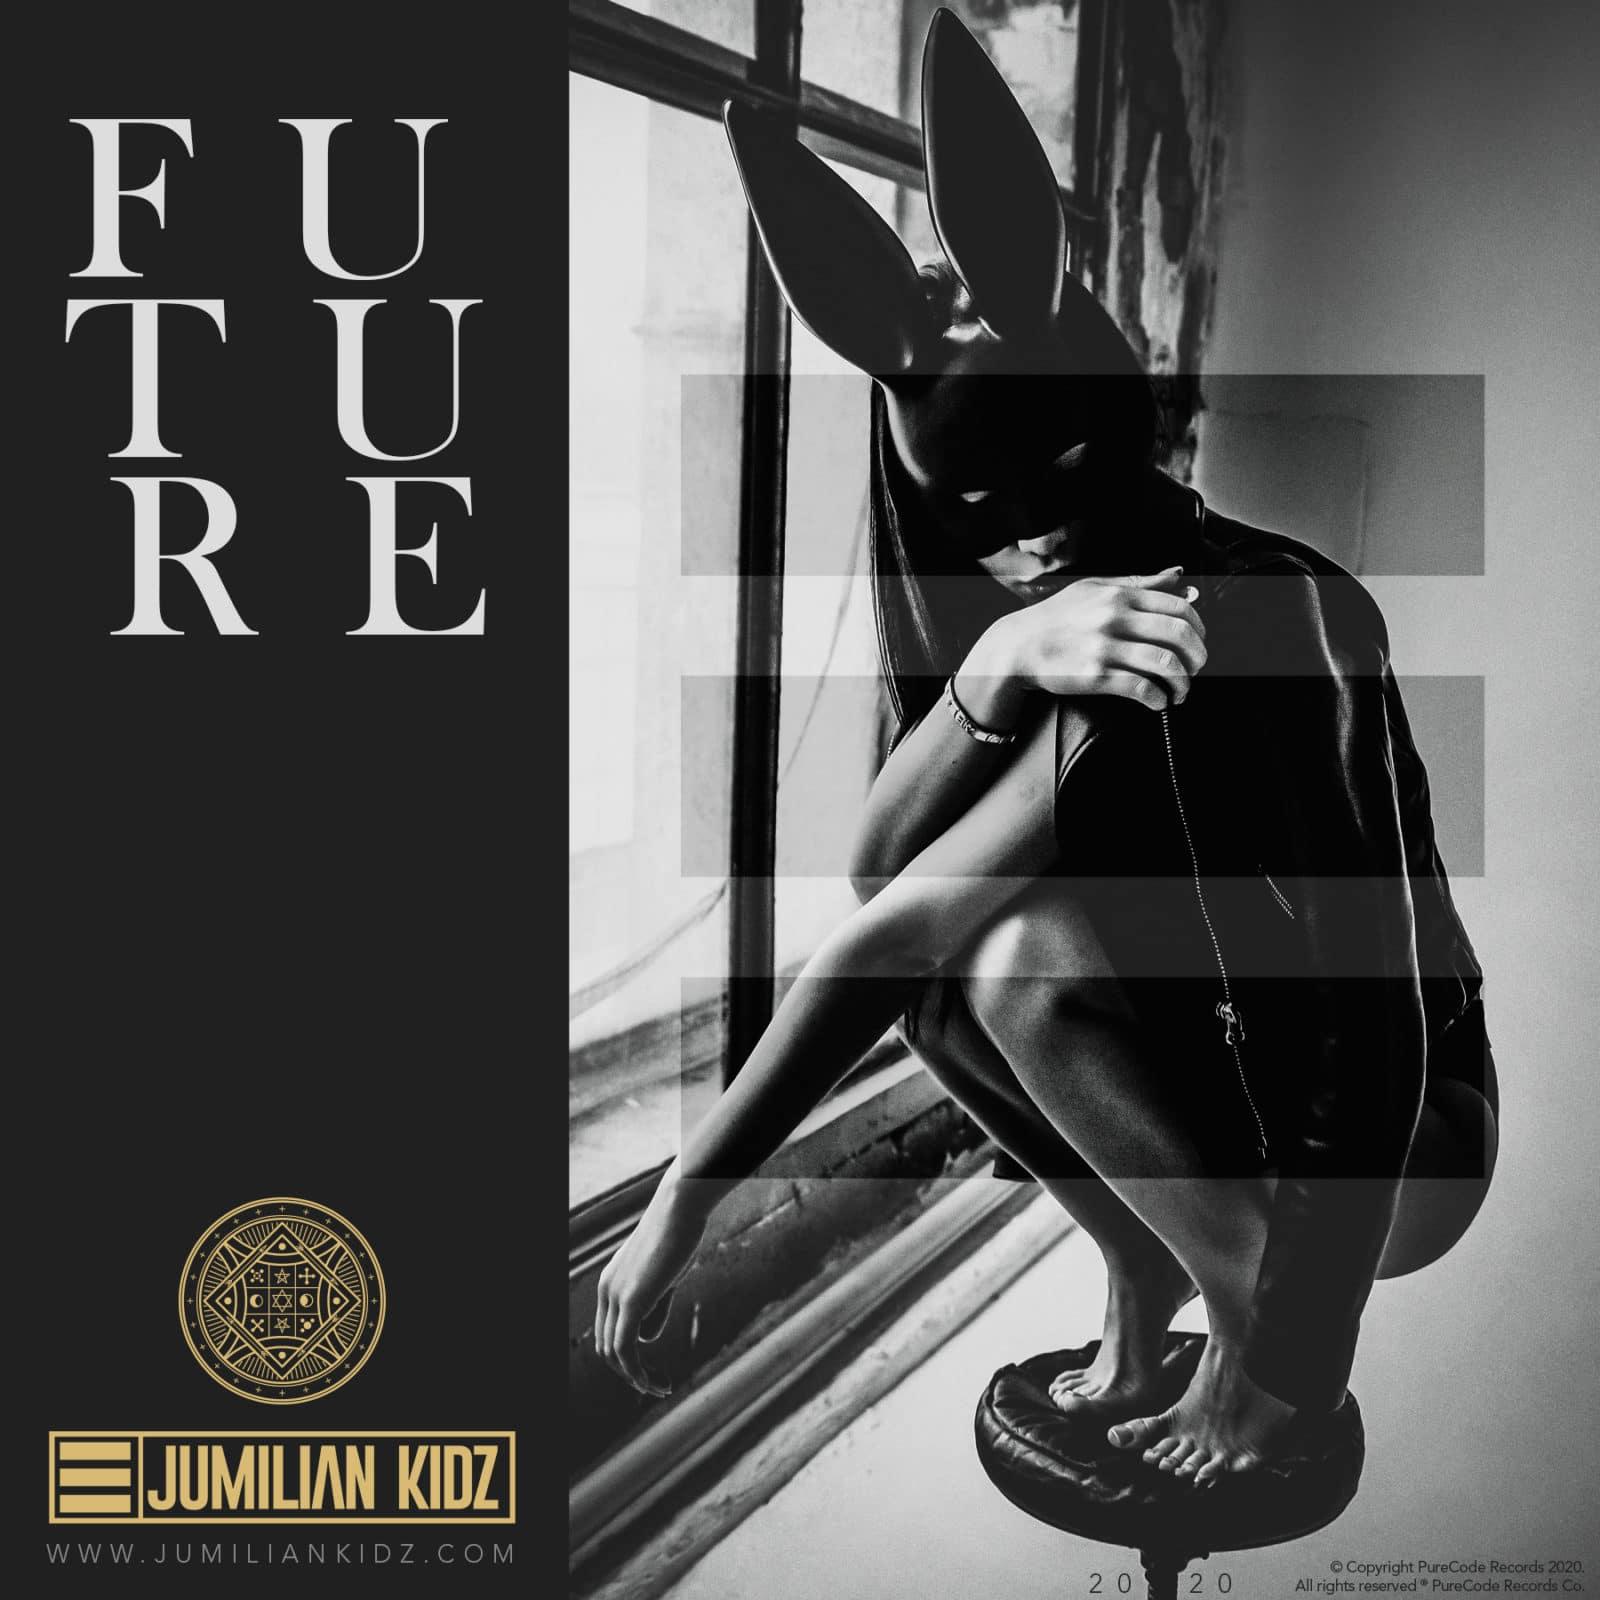 FUTURE EP by Jumilian Kidz [Album Cover]